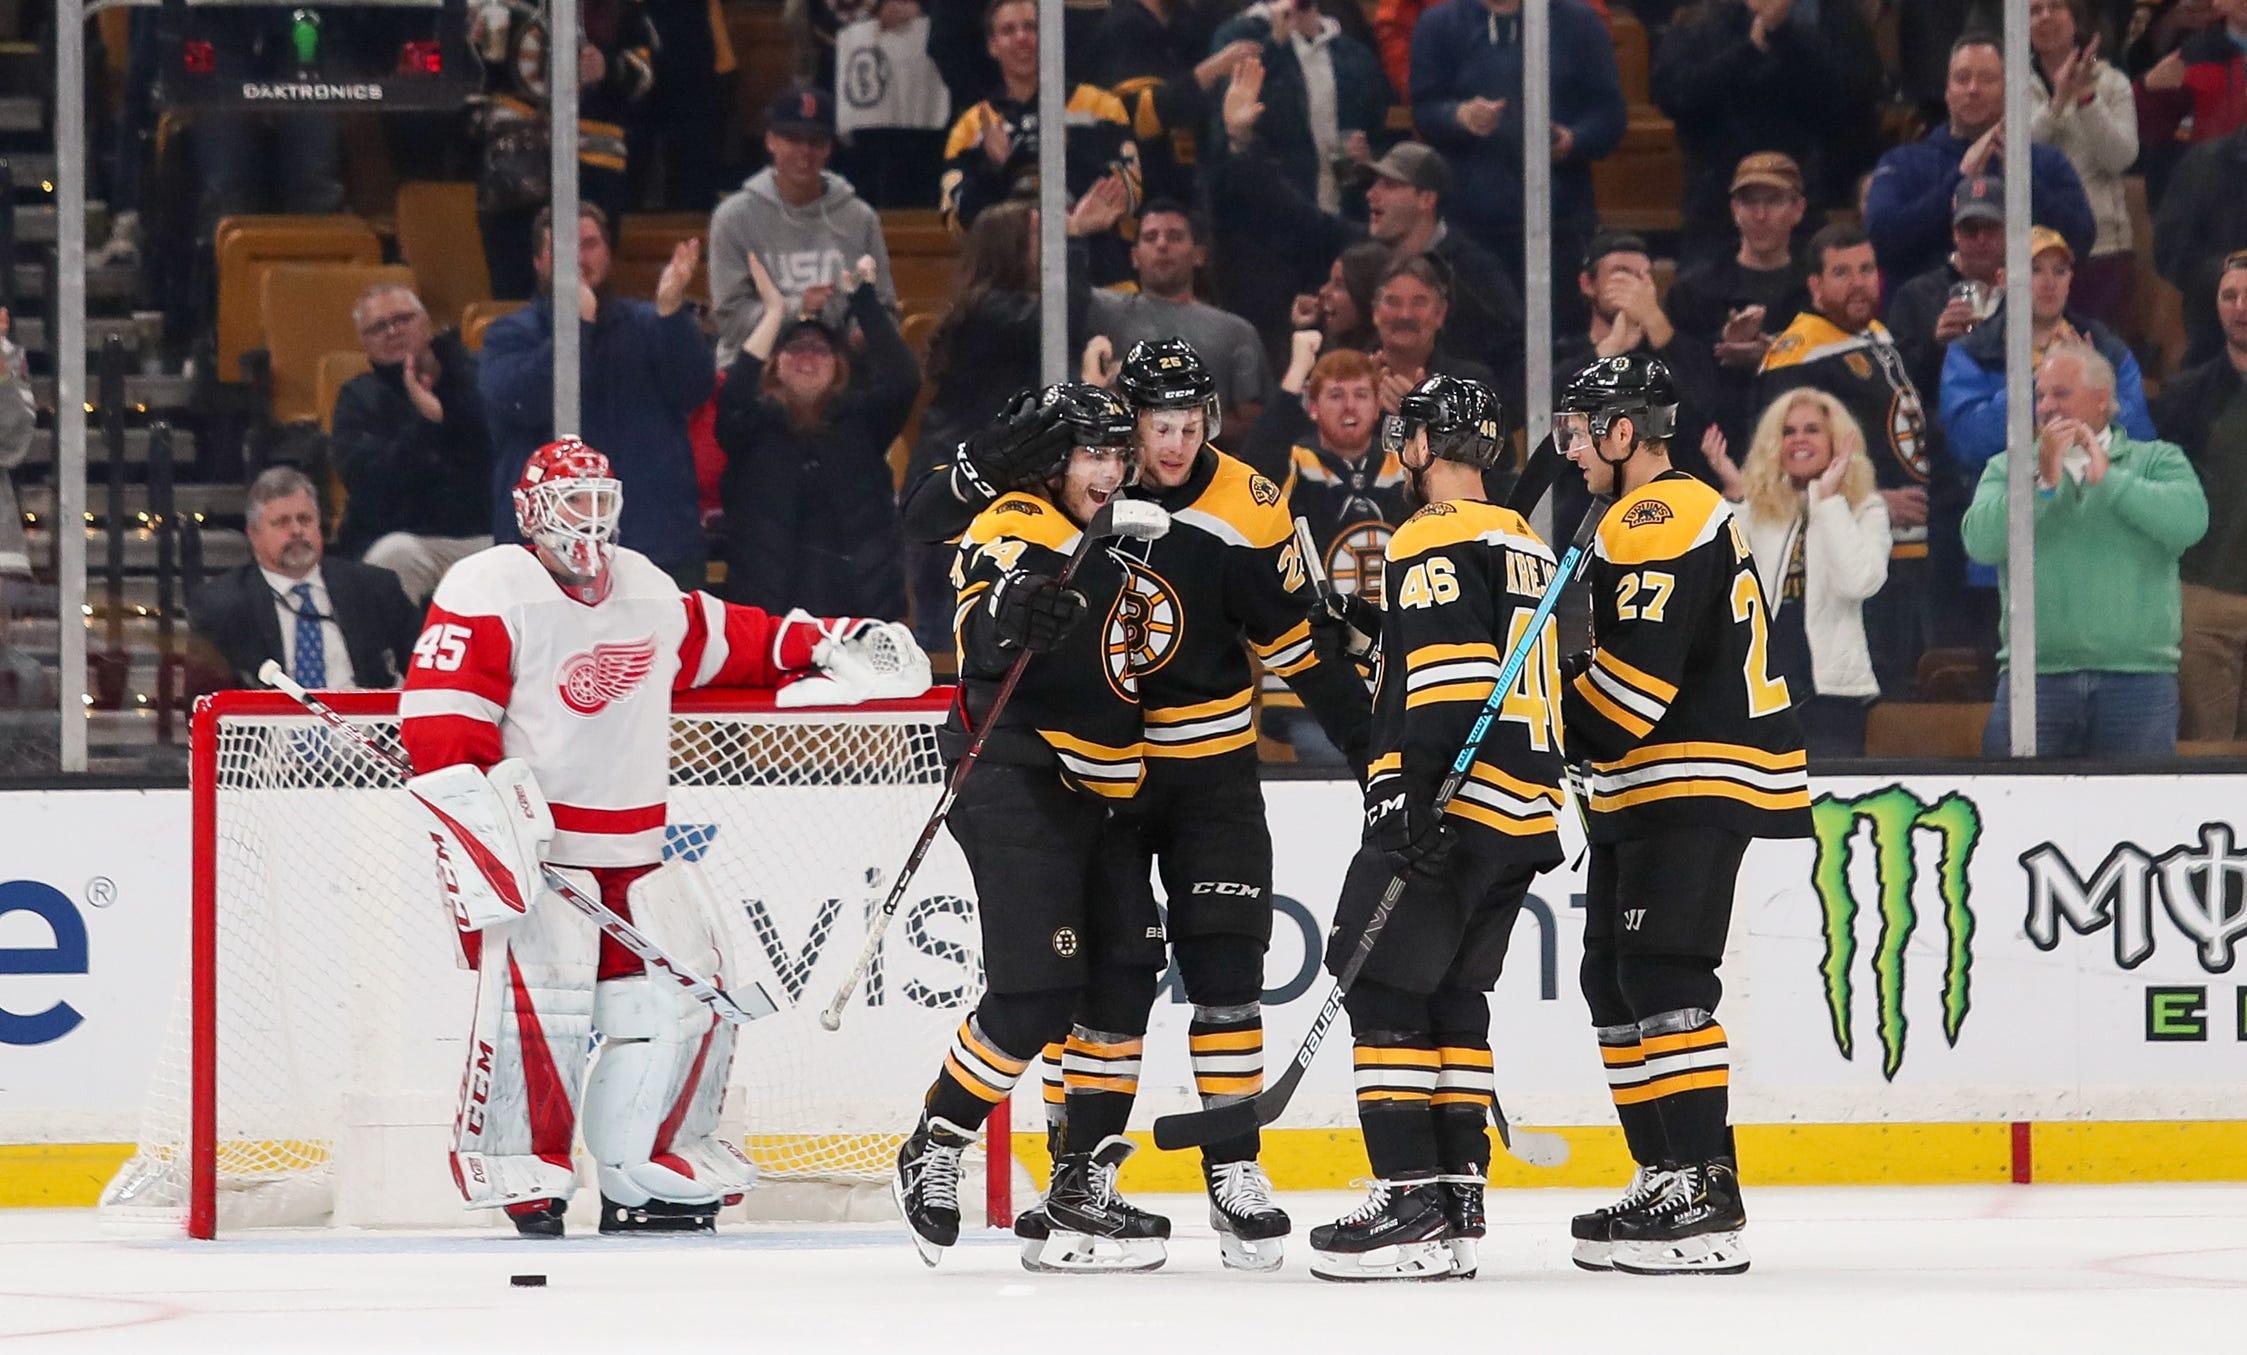 Nhl Detroit Red Wings At Boston Bruins